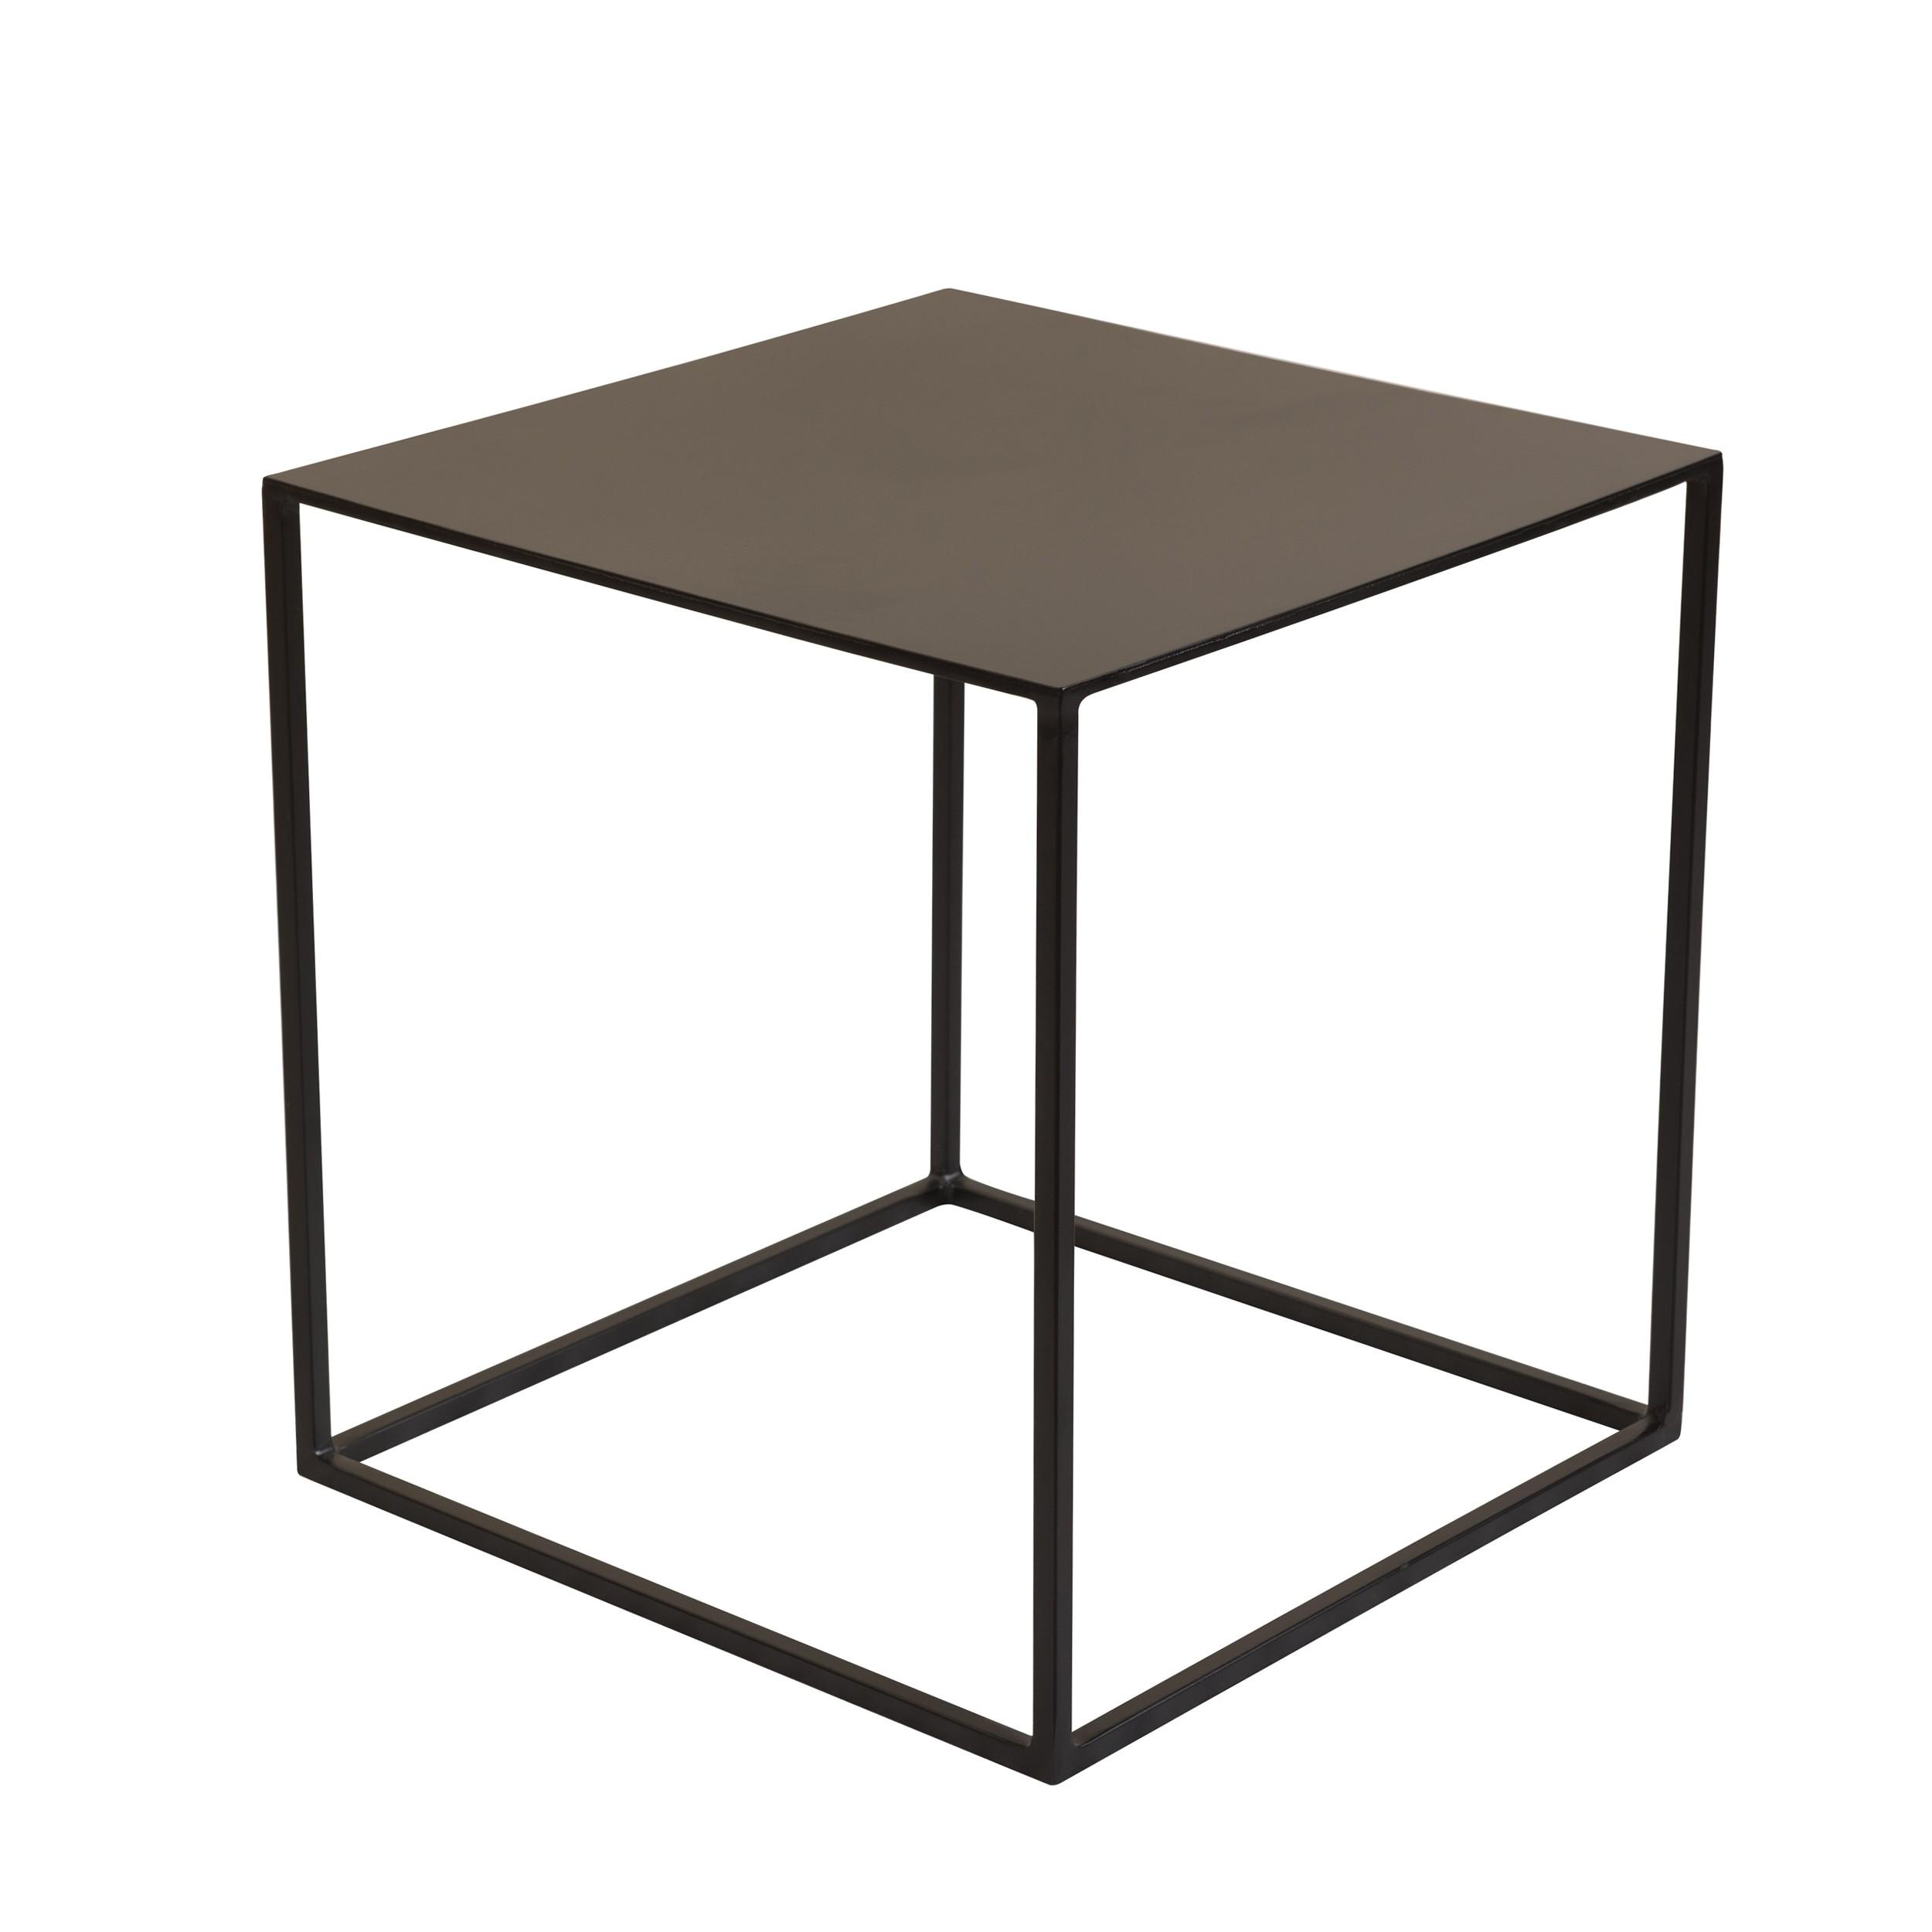 acheter table basse carree noire